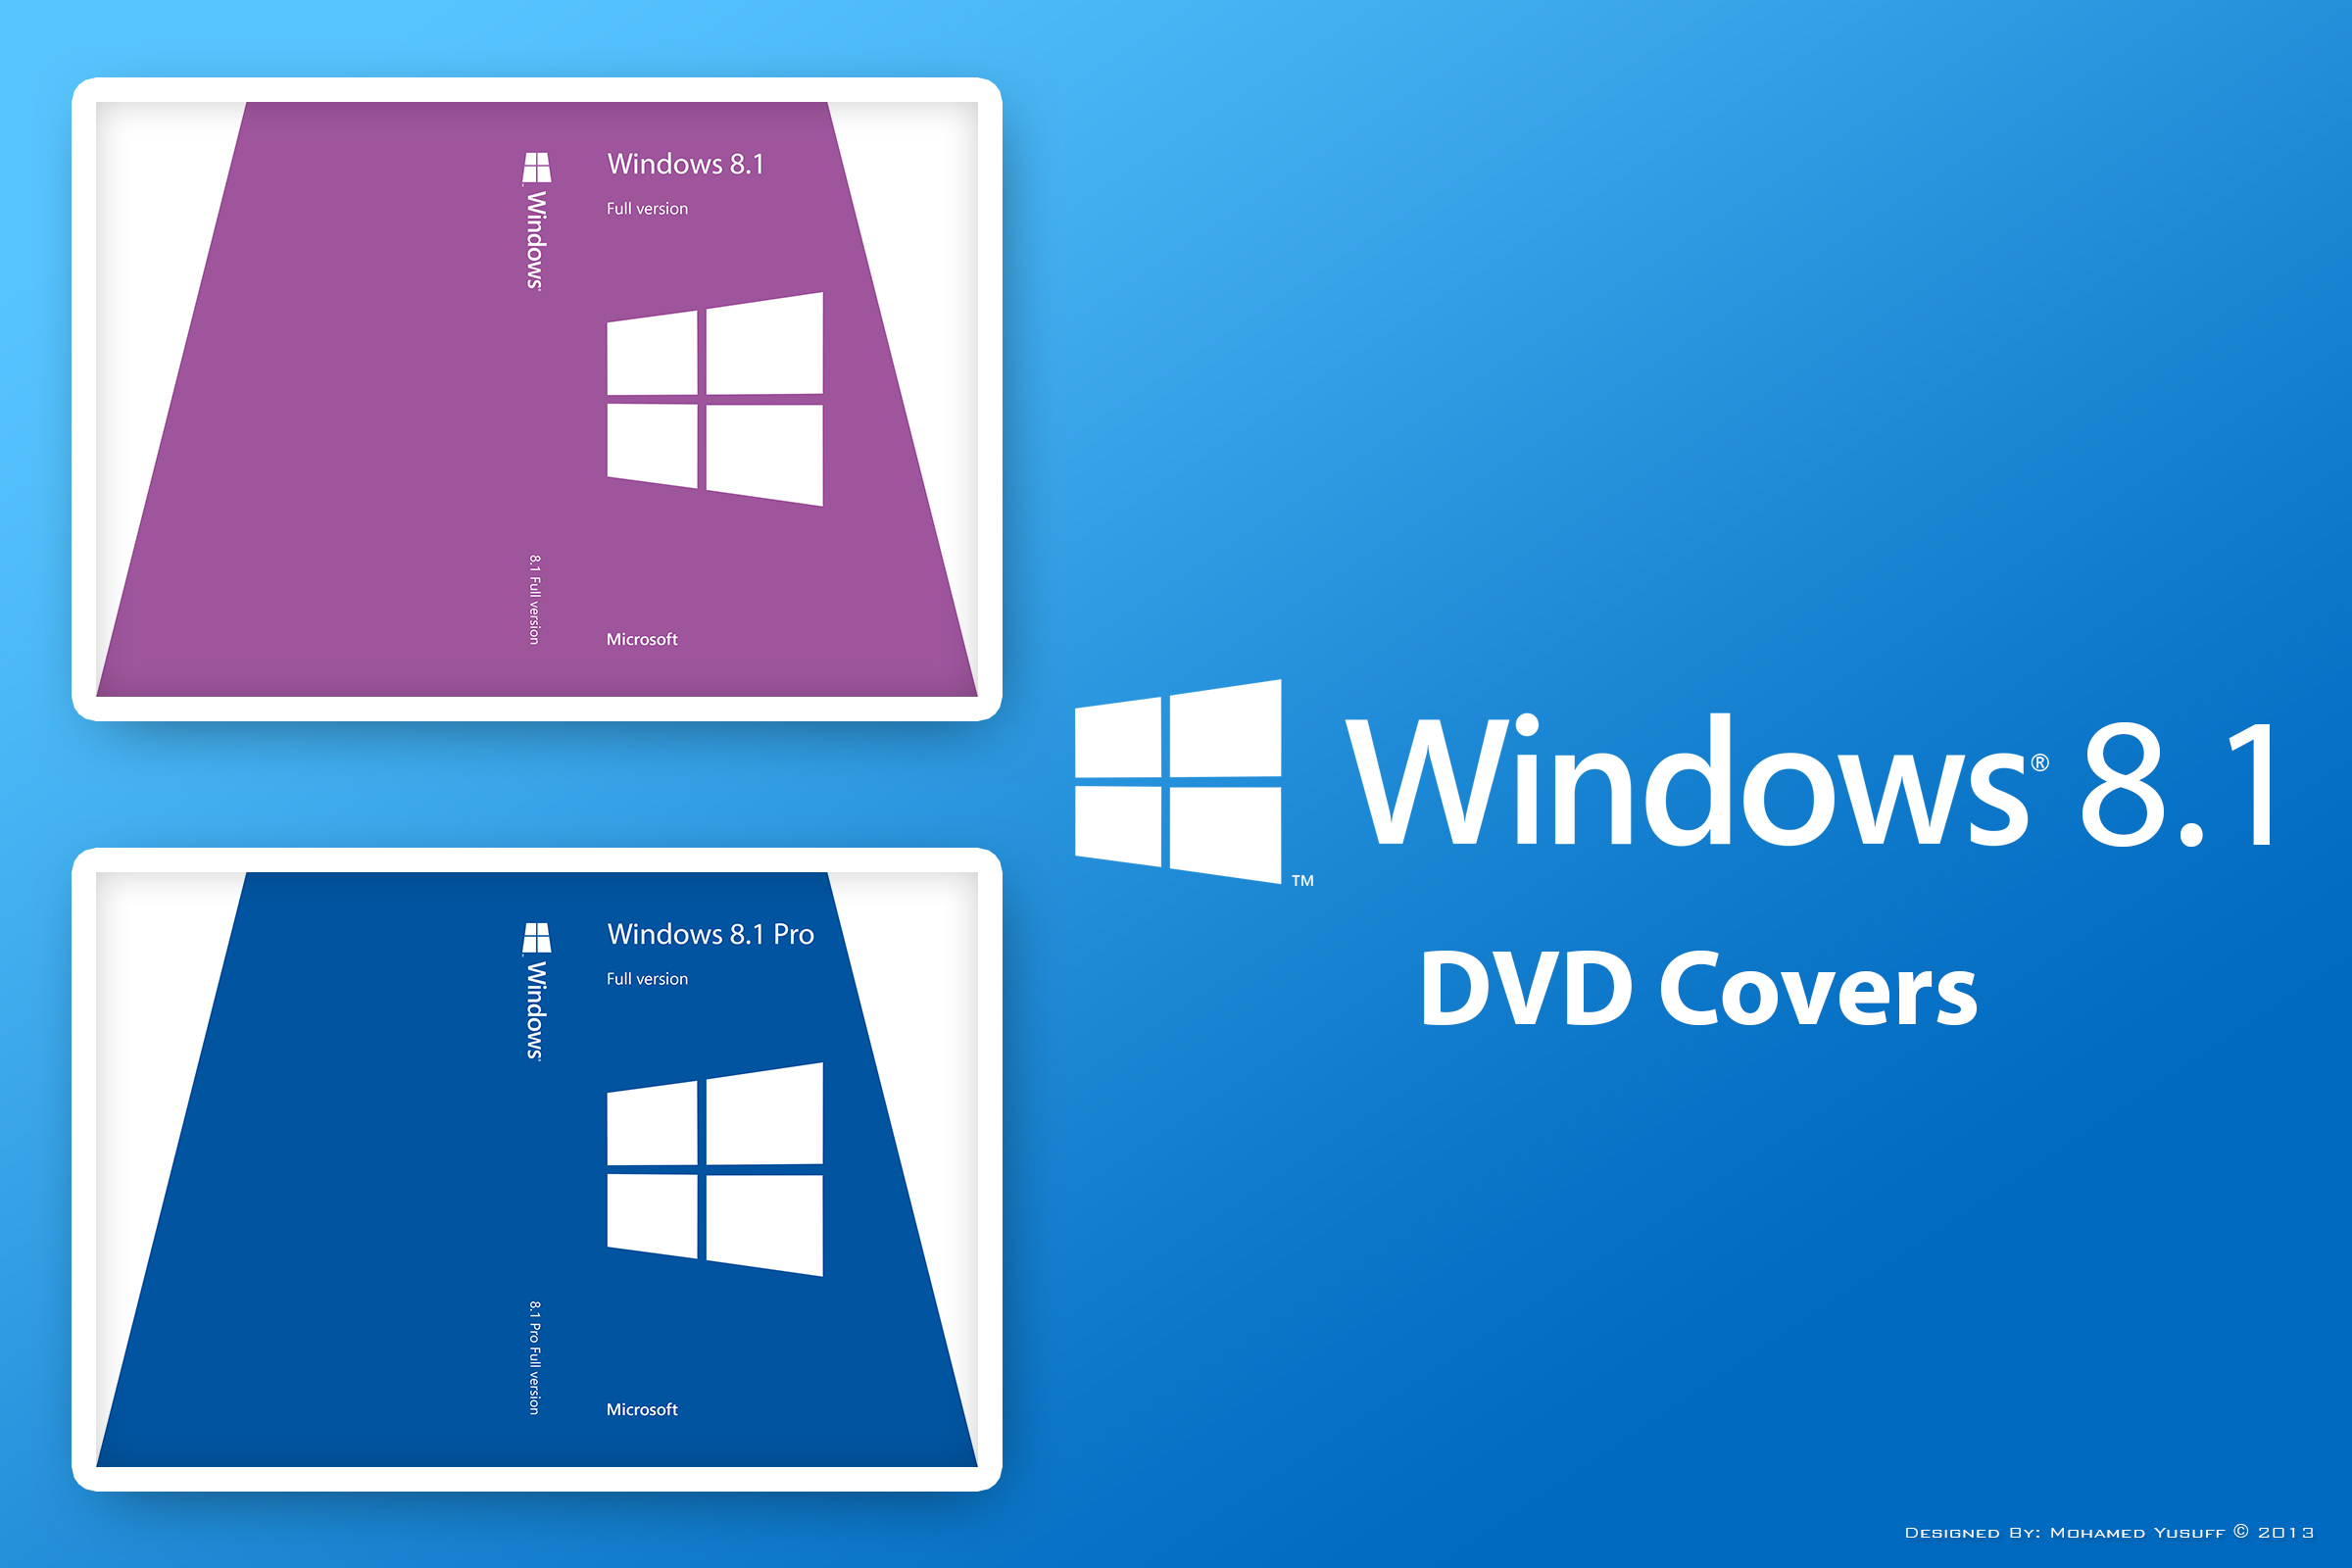 Windows 8.1 DVD Covers v1